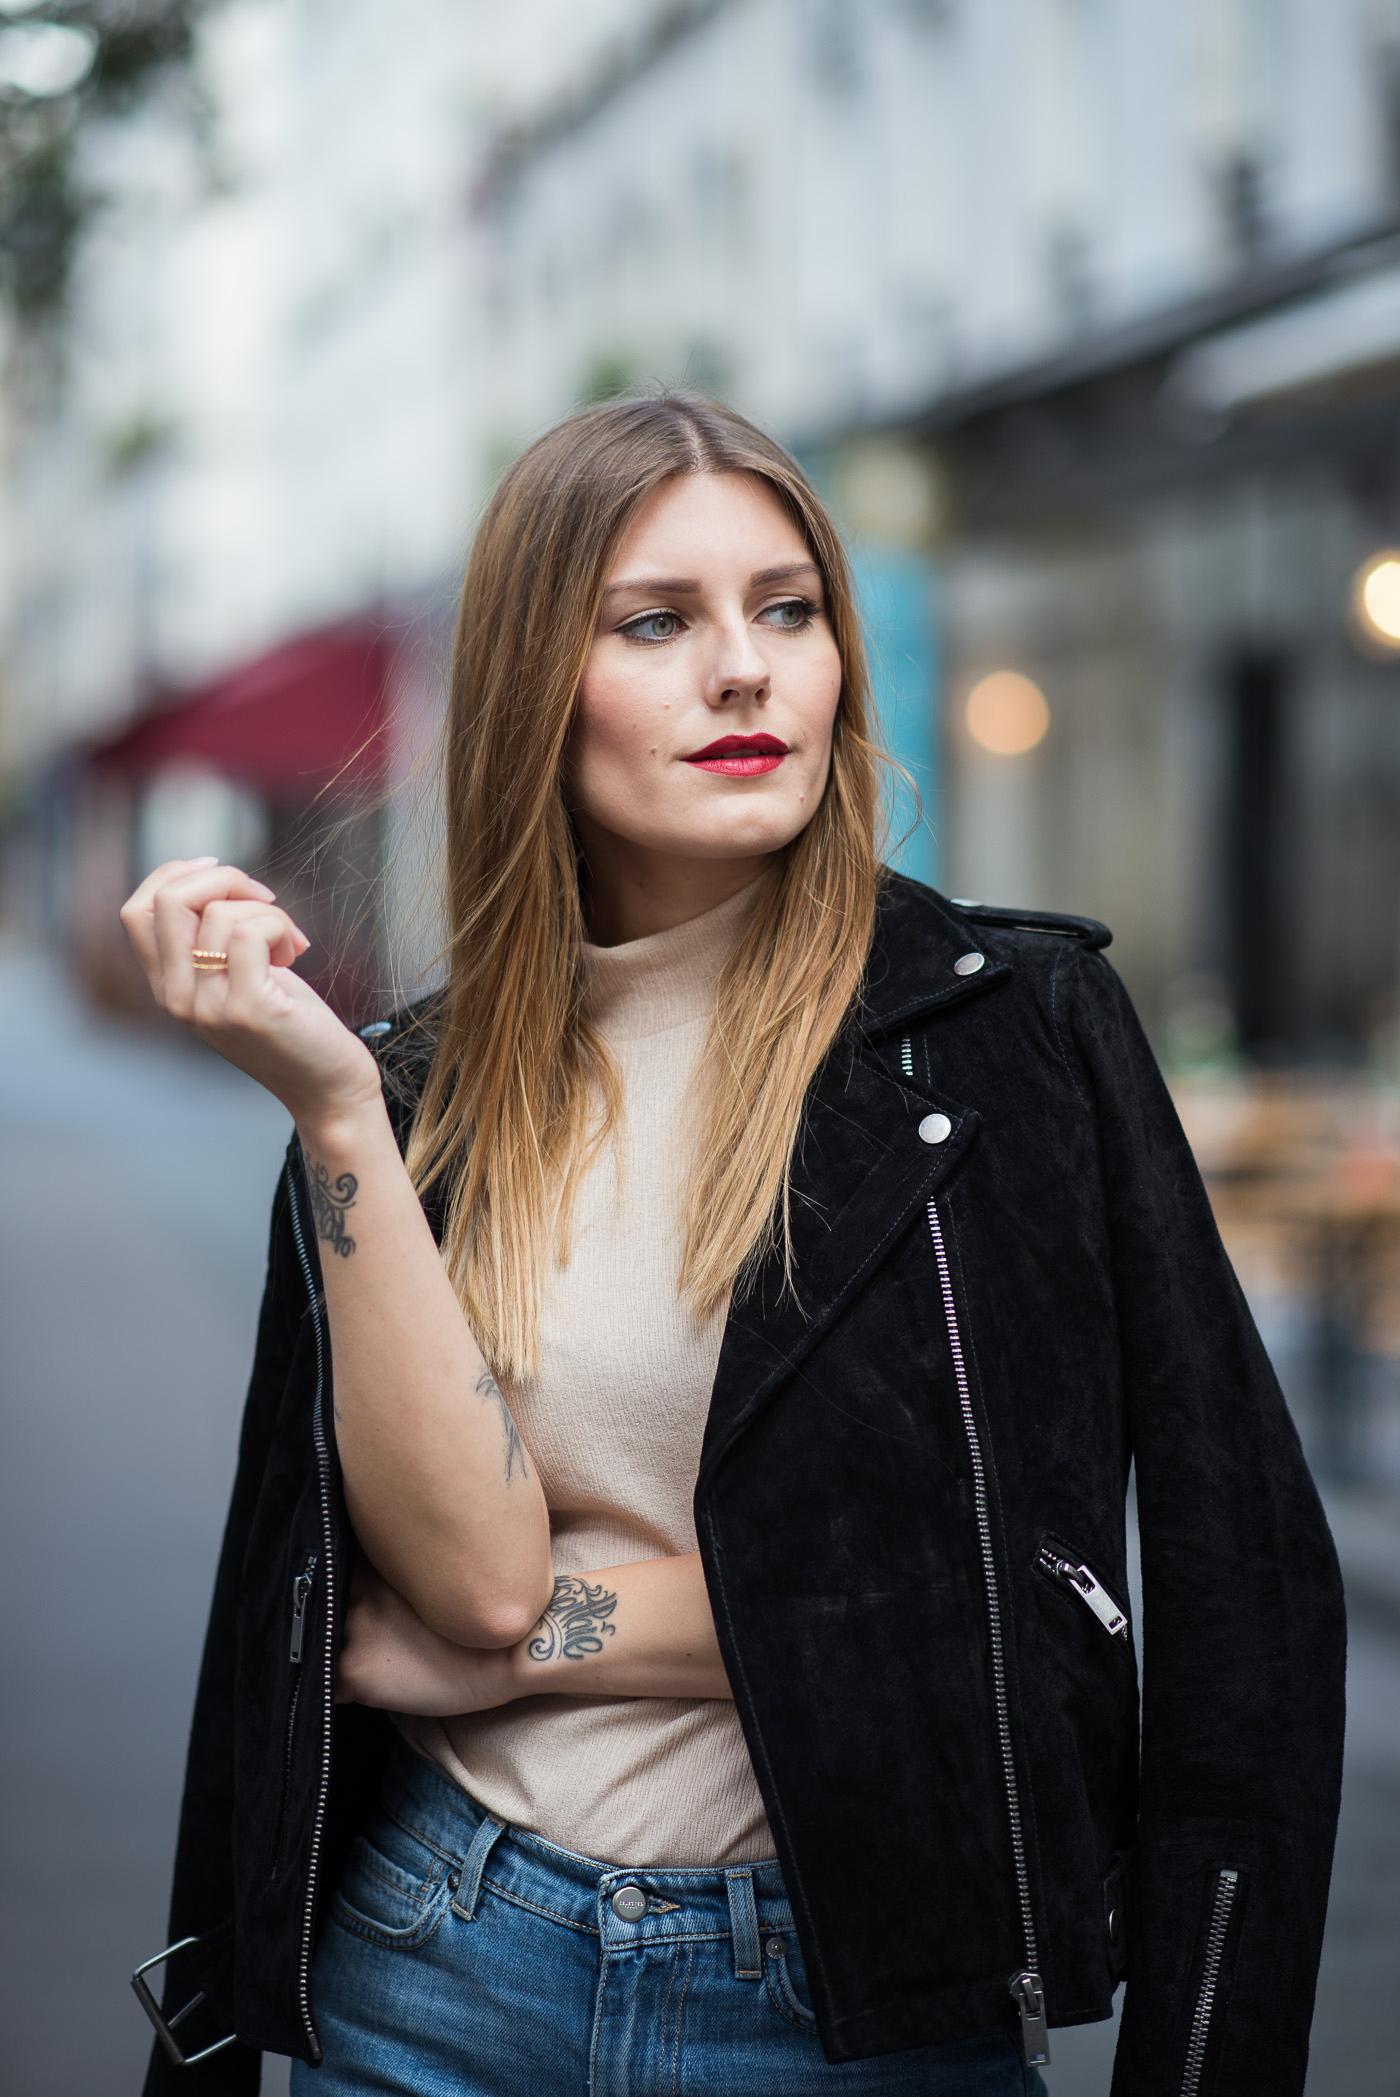 paris_fashion_week_leather_jacket_selected_femme_2